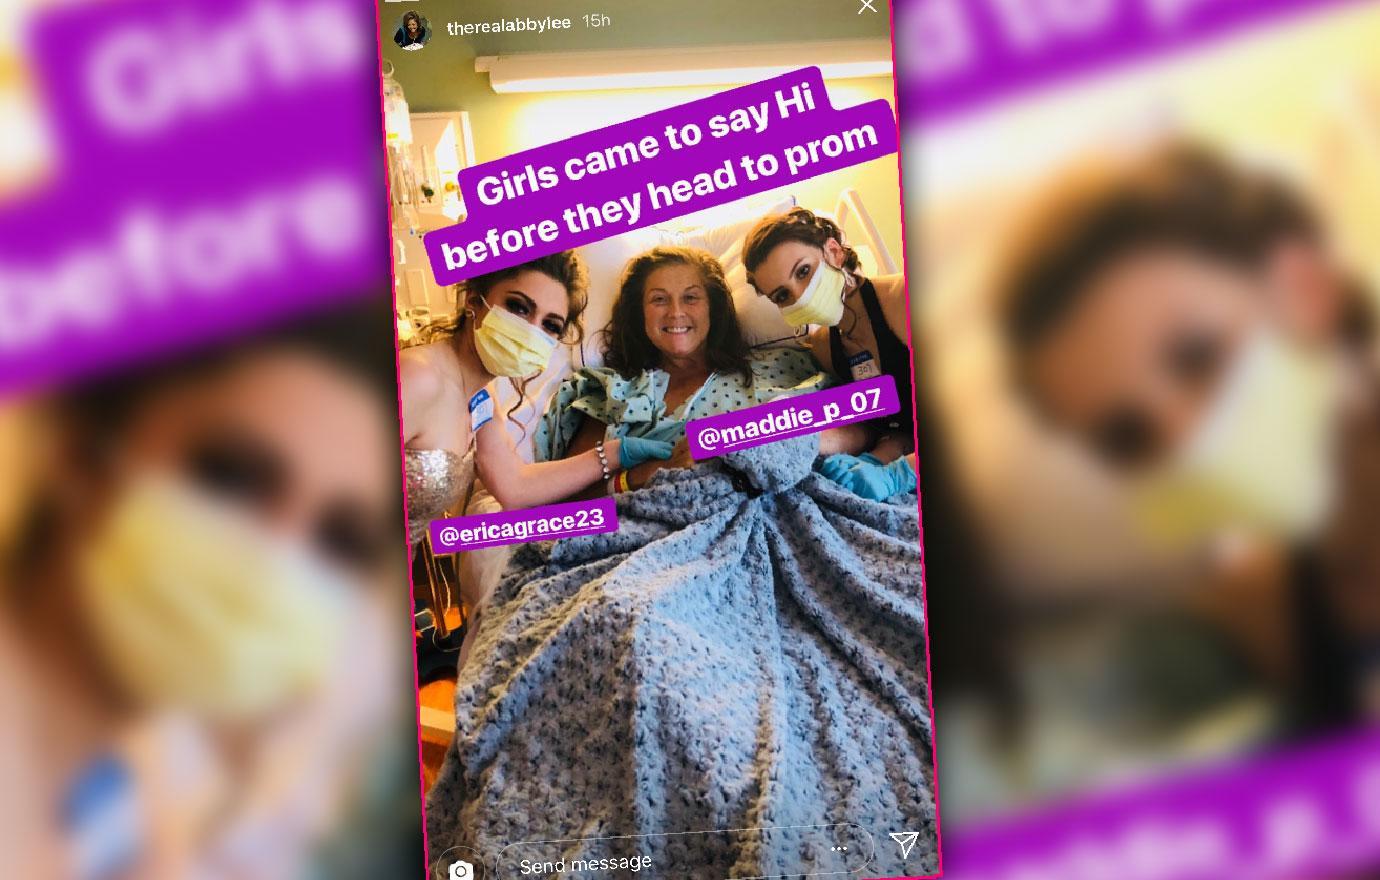 Cancer-Stricken Abby Lee Miller Gets Hospital Visit From Dance Girls